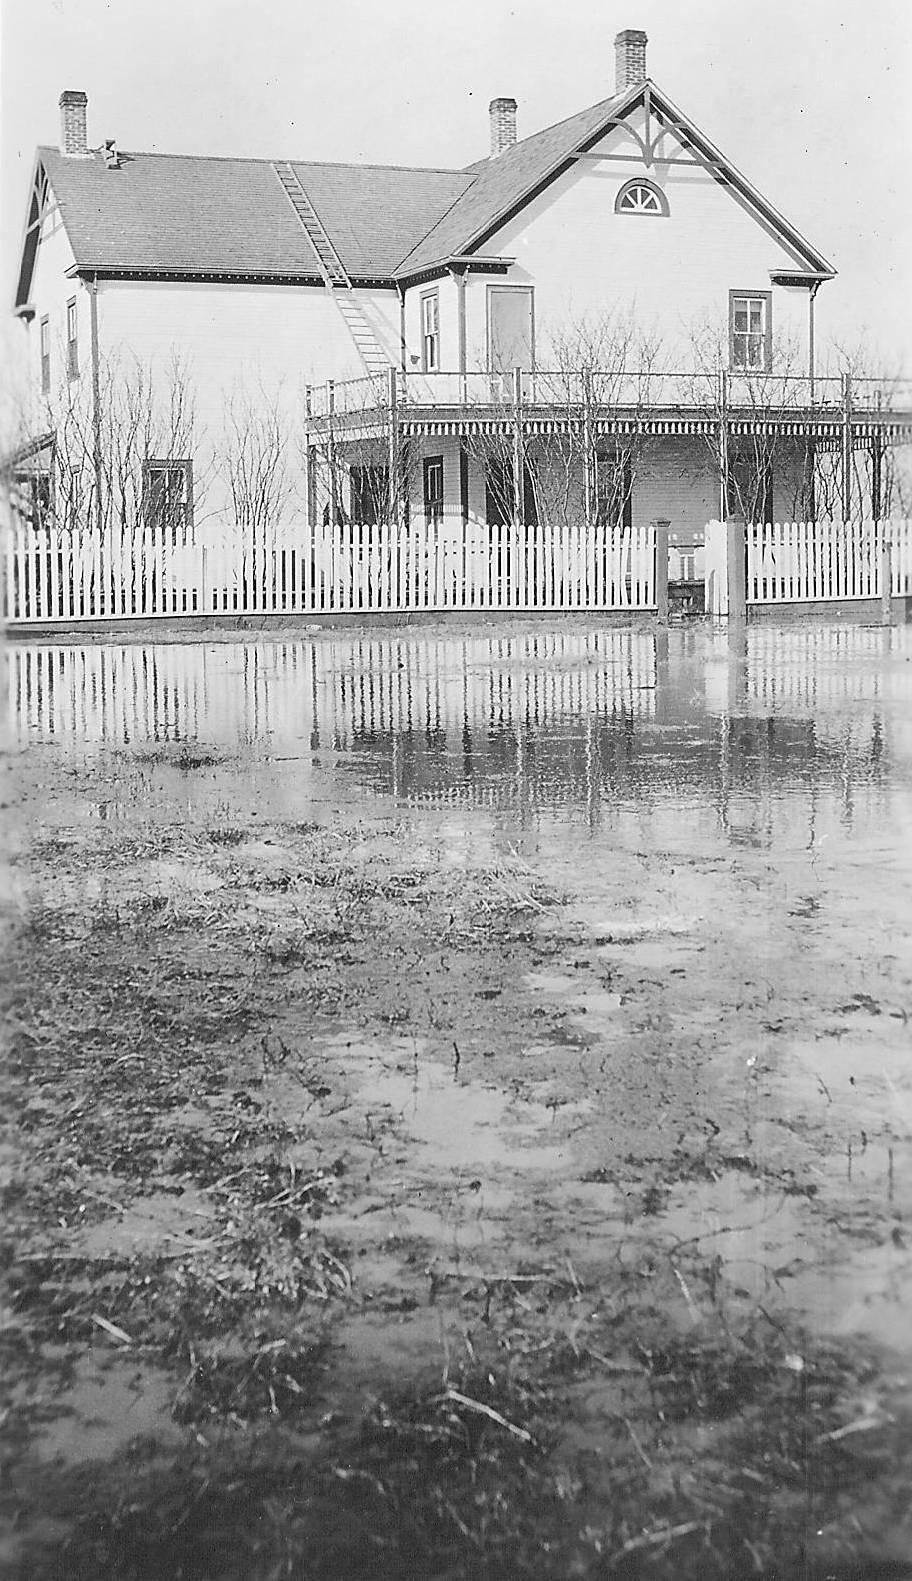 Old Bay House flooded 1934. 998.05.23.44 / Lamberton, Rev Hugh and Lillian